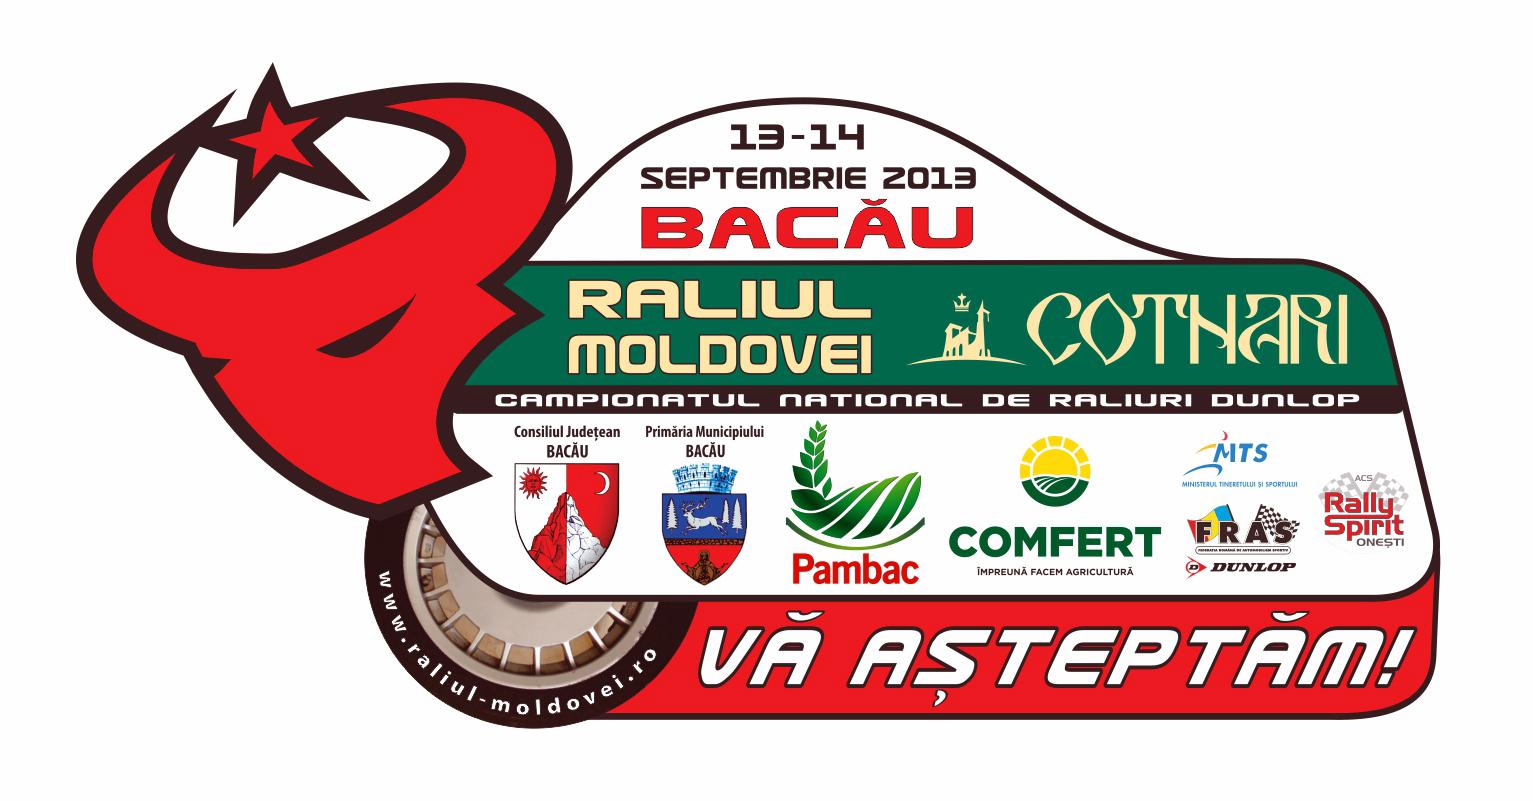 Cotnari este partenerul principal al Raliului Moldovei Bacau in 2013